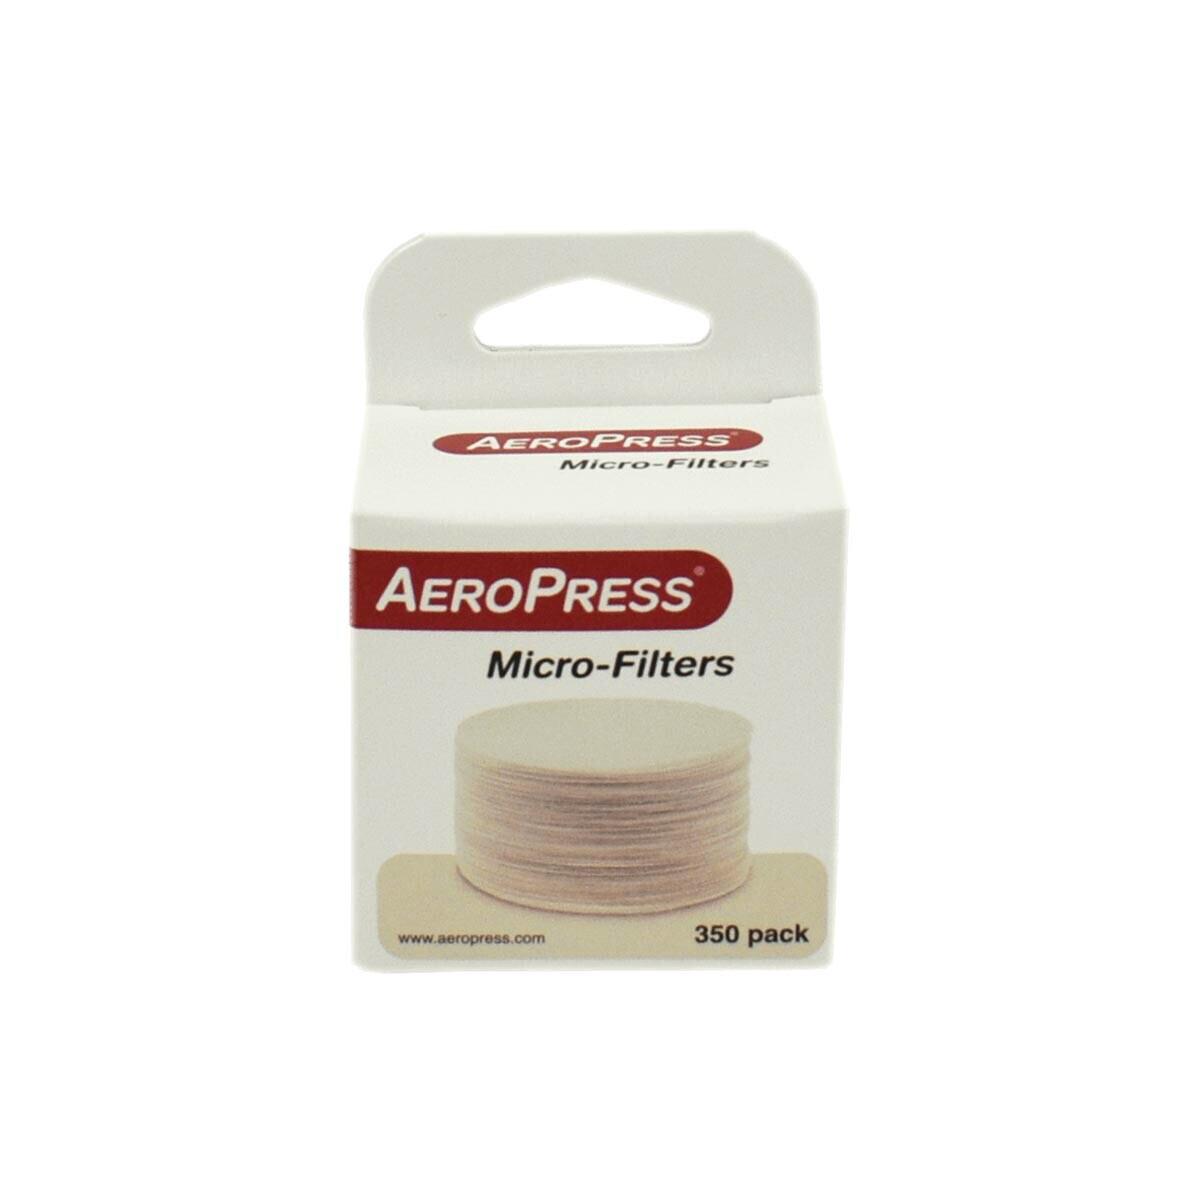 AeroPress Micro-Filters for AeroPress & AeroPress Go